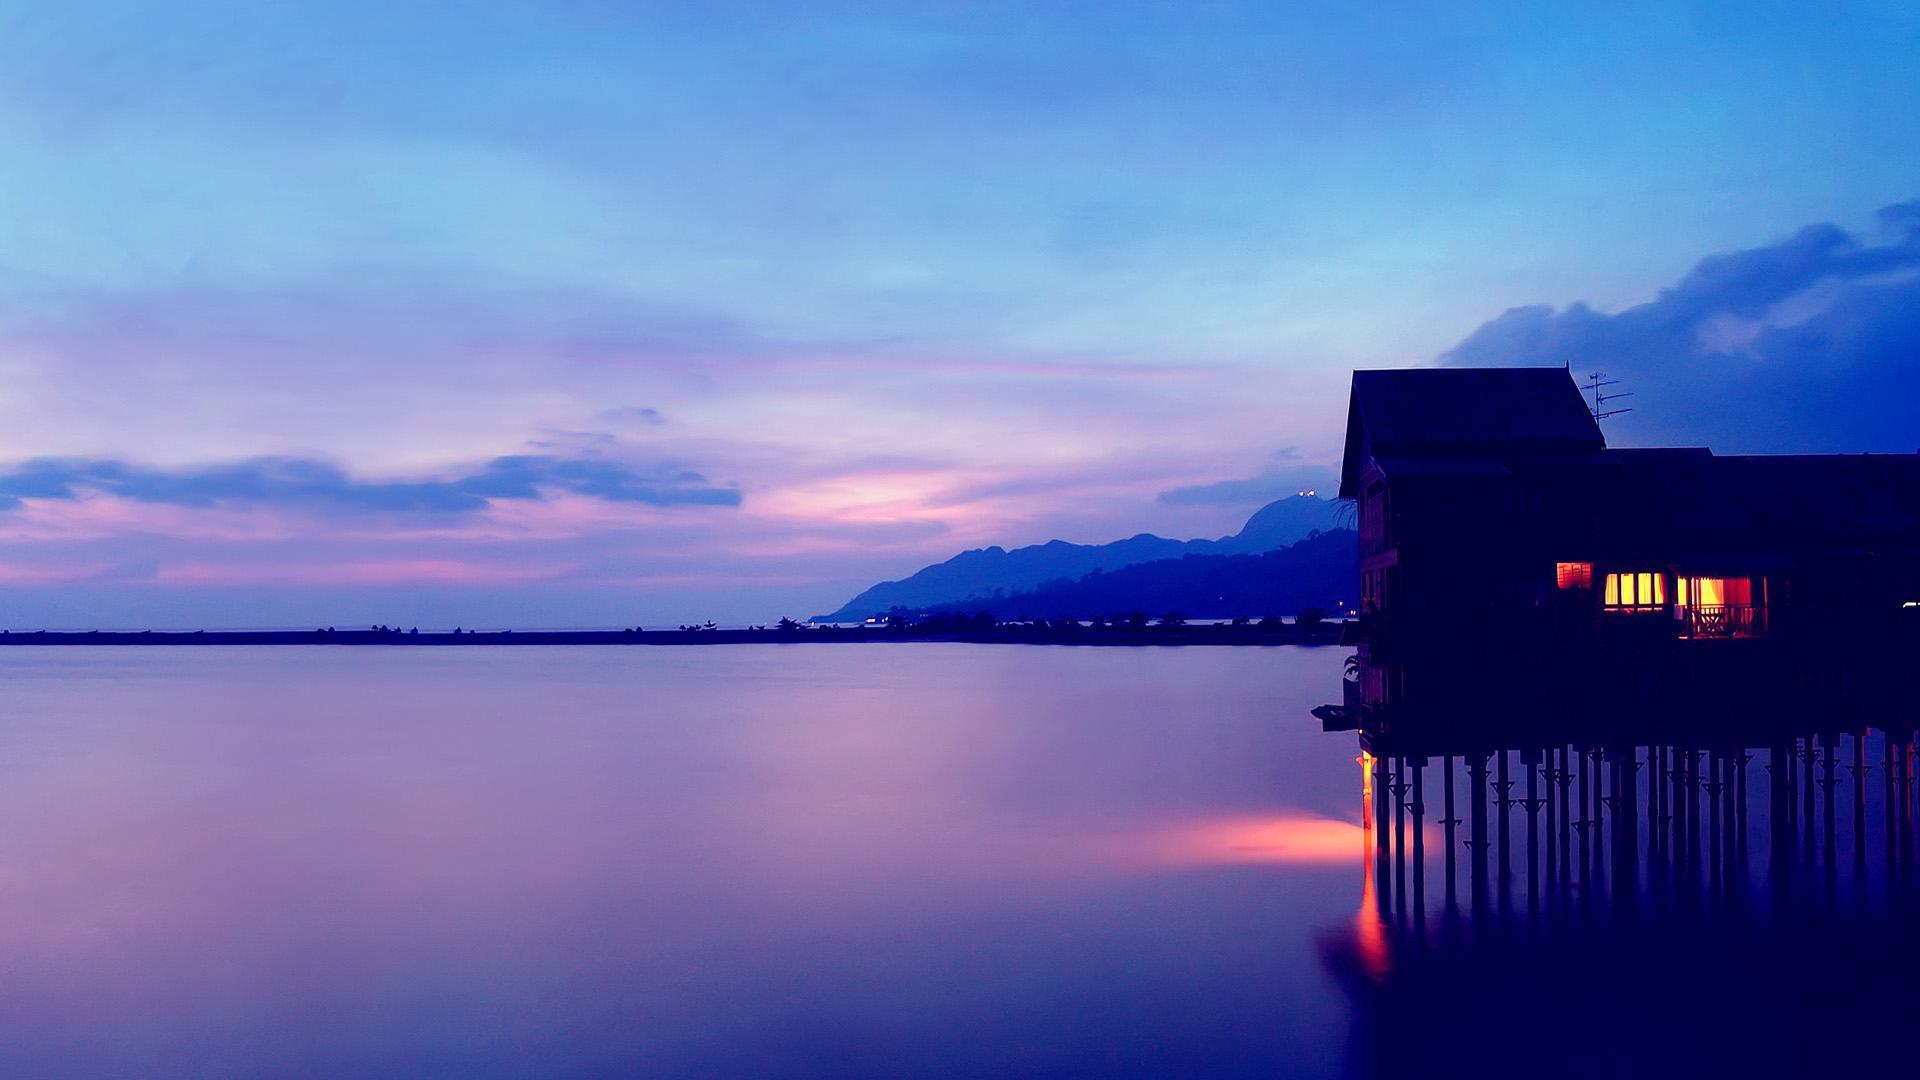 wallpaper Twilight landscape beautiful sunset coast desktop 1920x1080